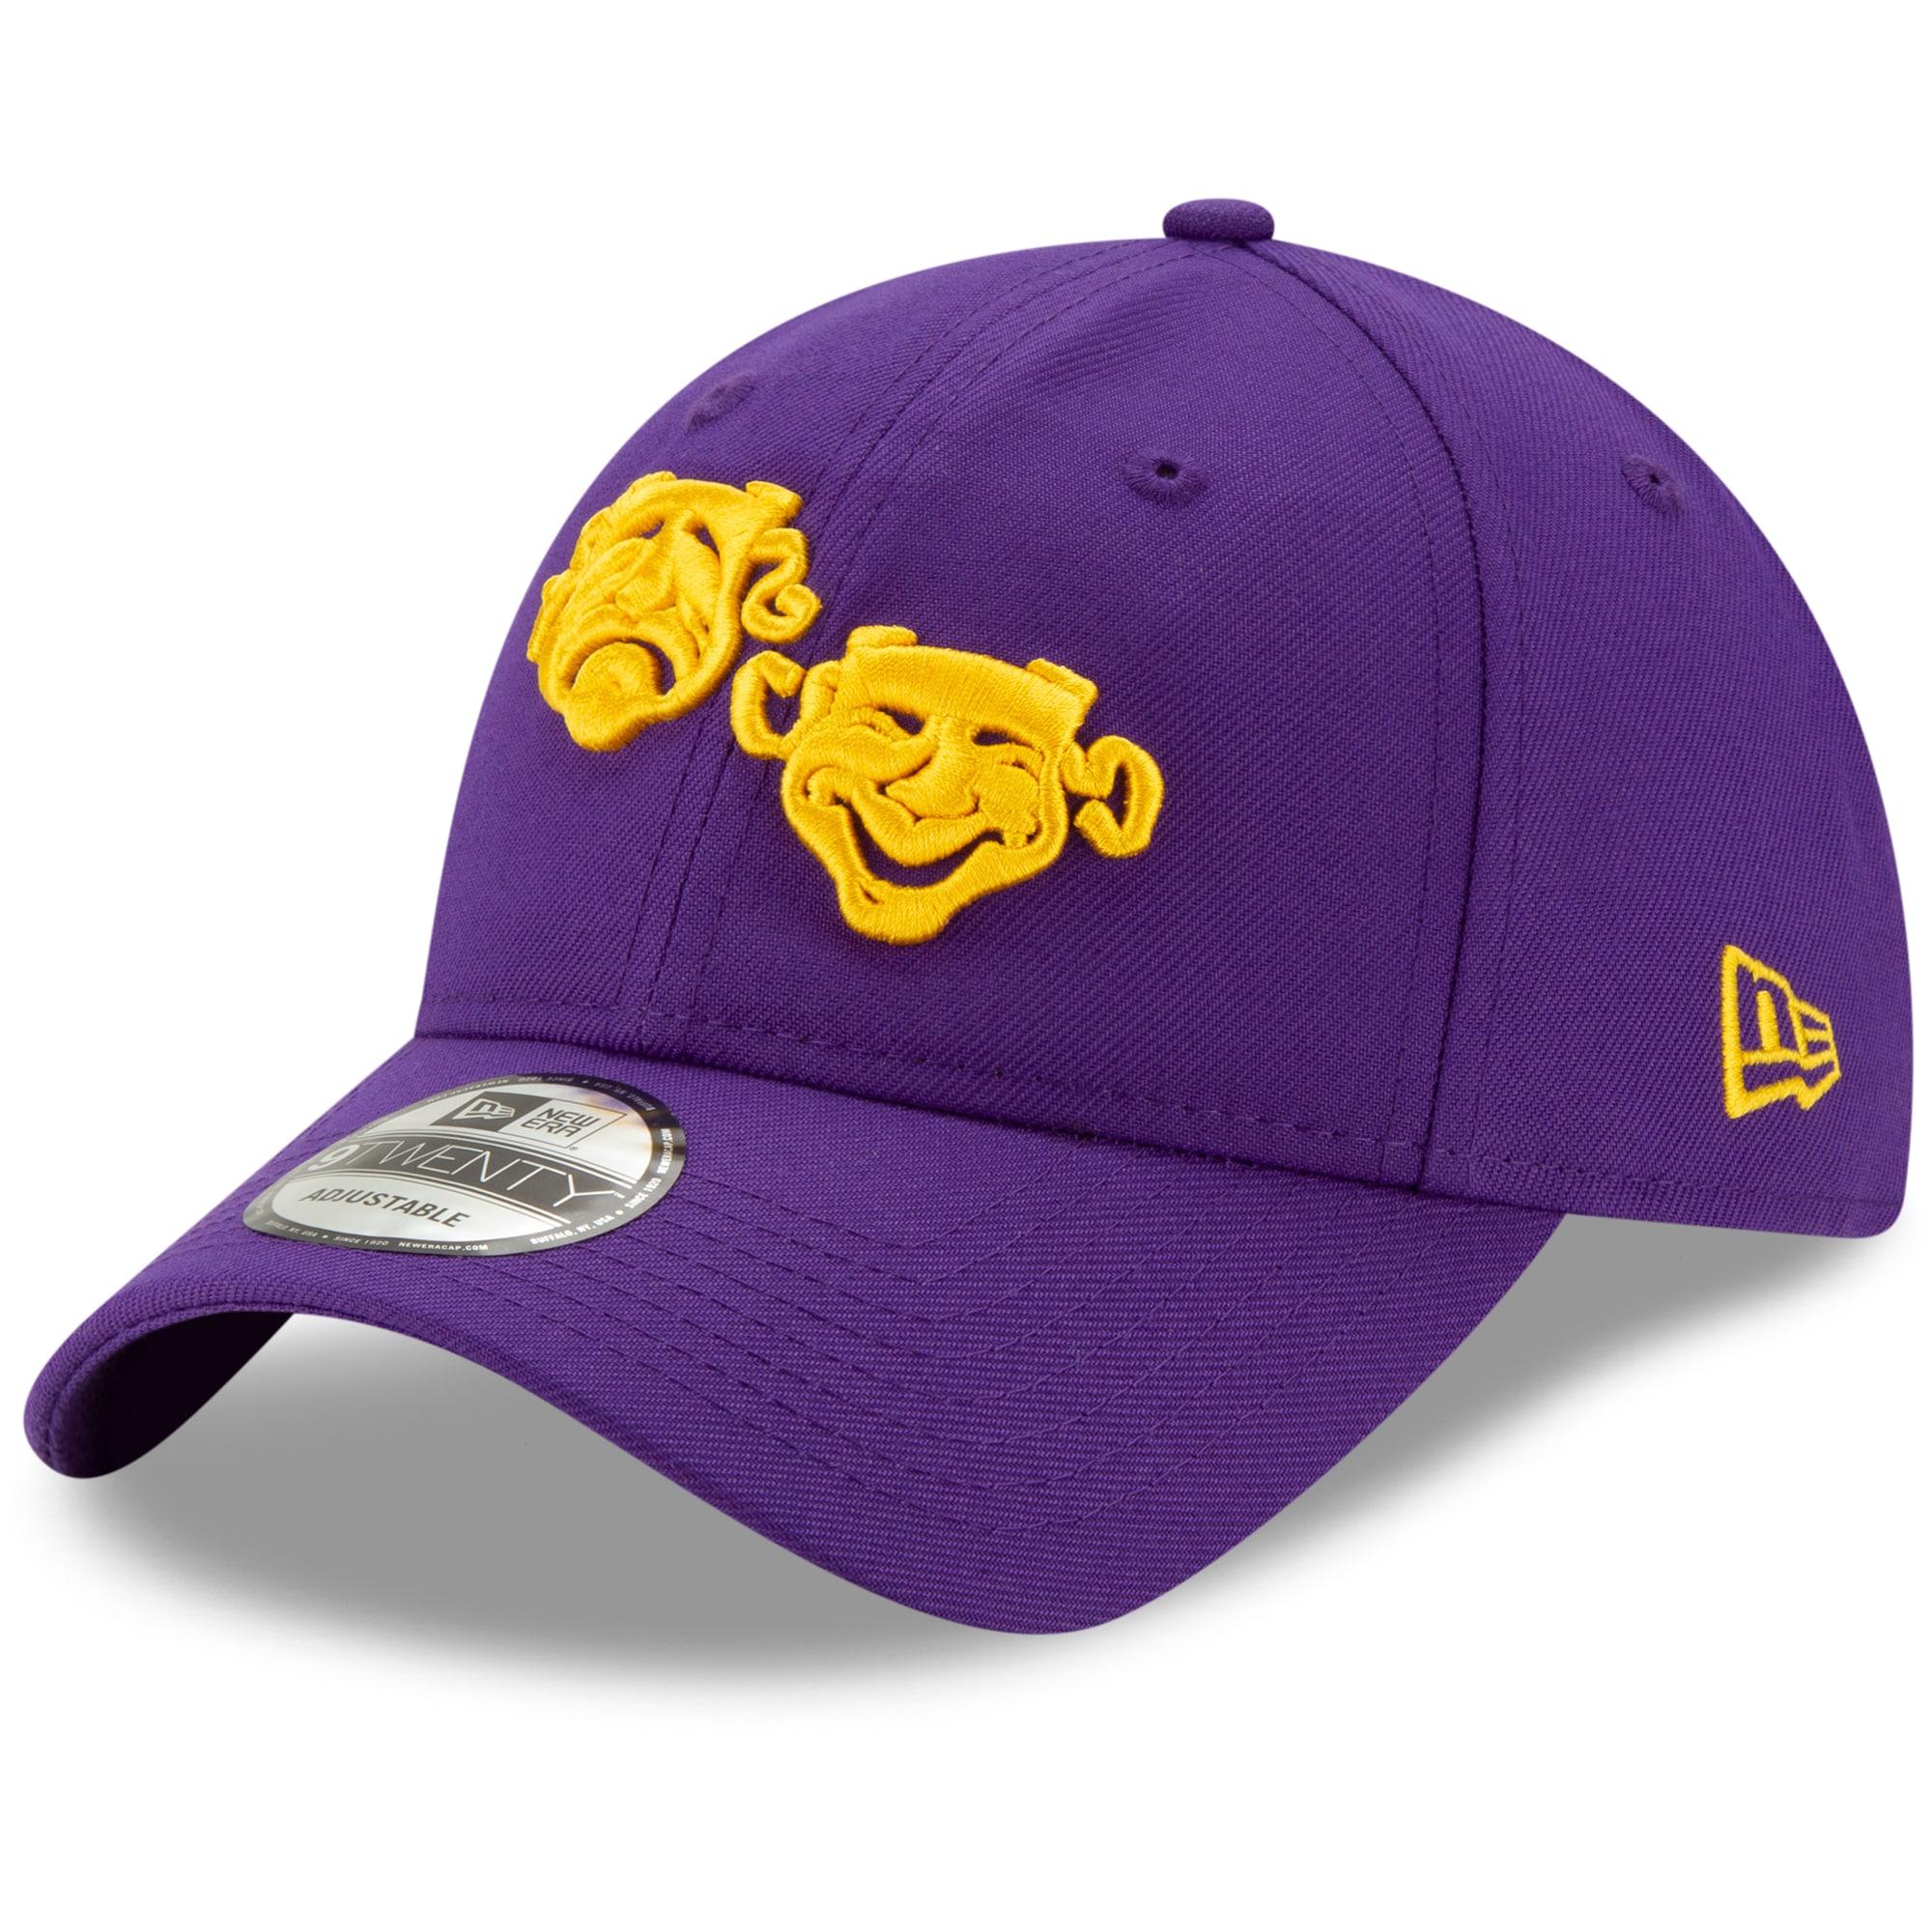 New Orleans Pelicans New Era 2019/20 City Edition 9TWENTY Adjustable Hat - Purple